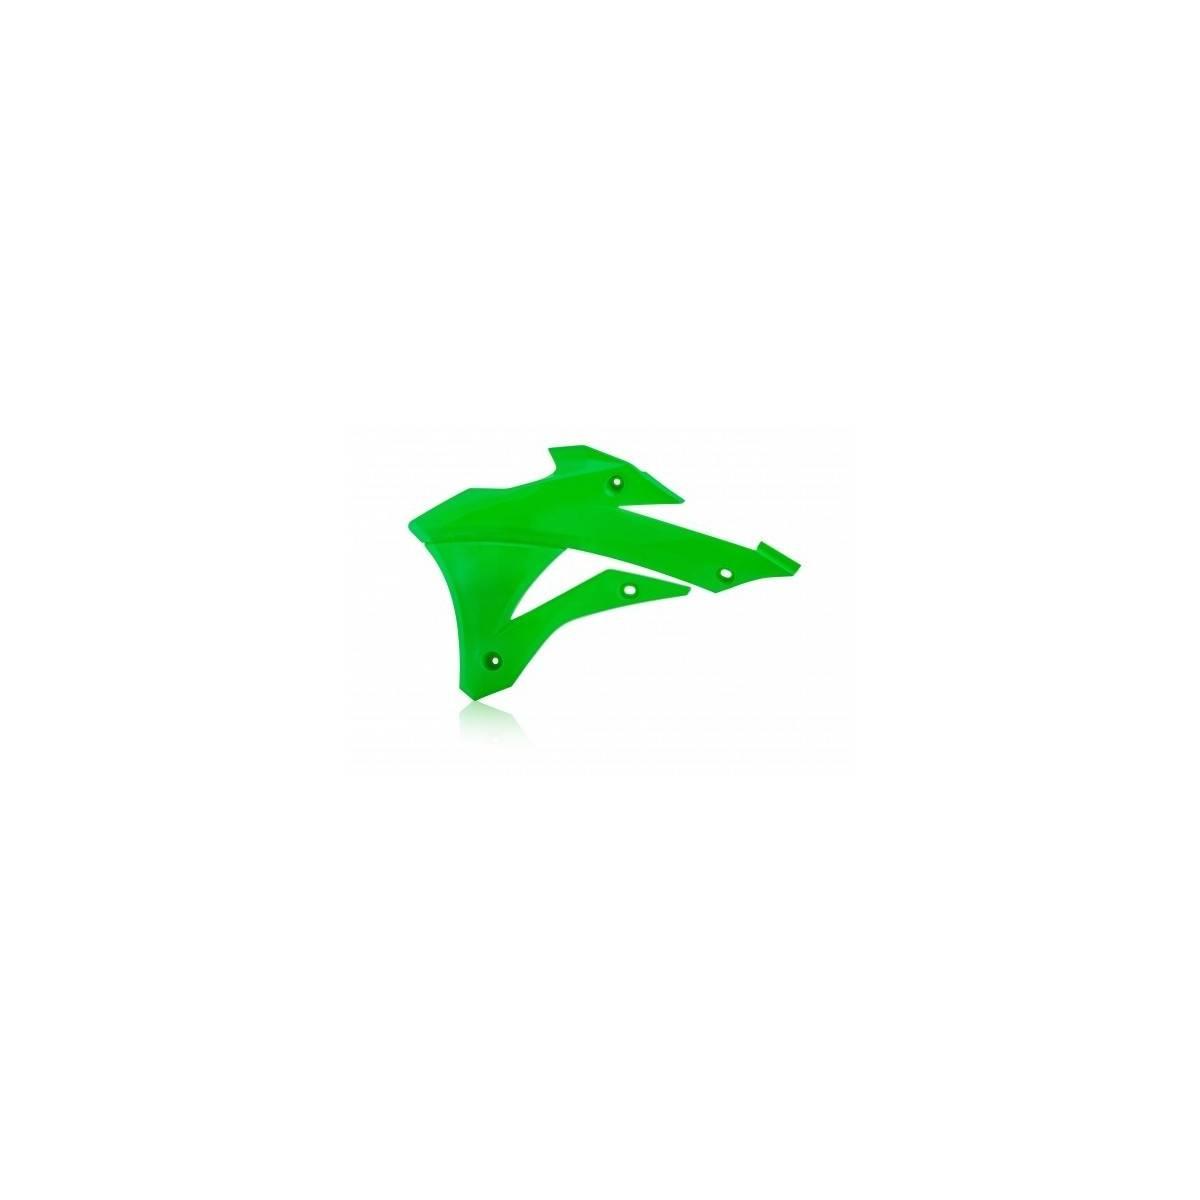 0017242-131 - Tapa Radiador Kx85 100 14 18 Blanco Verde